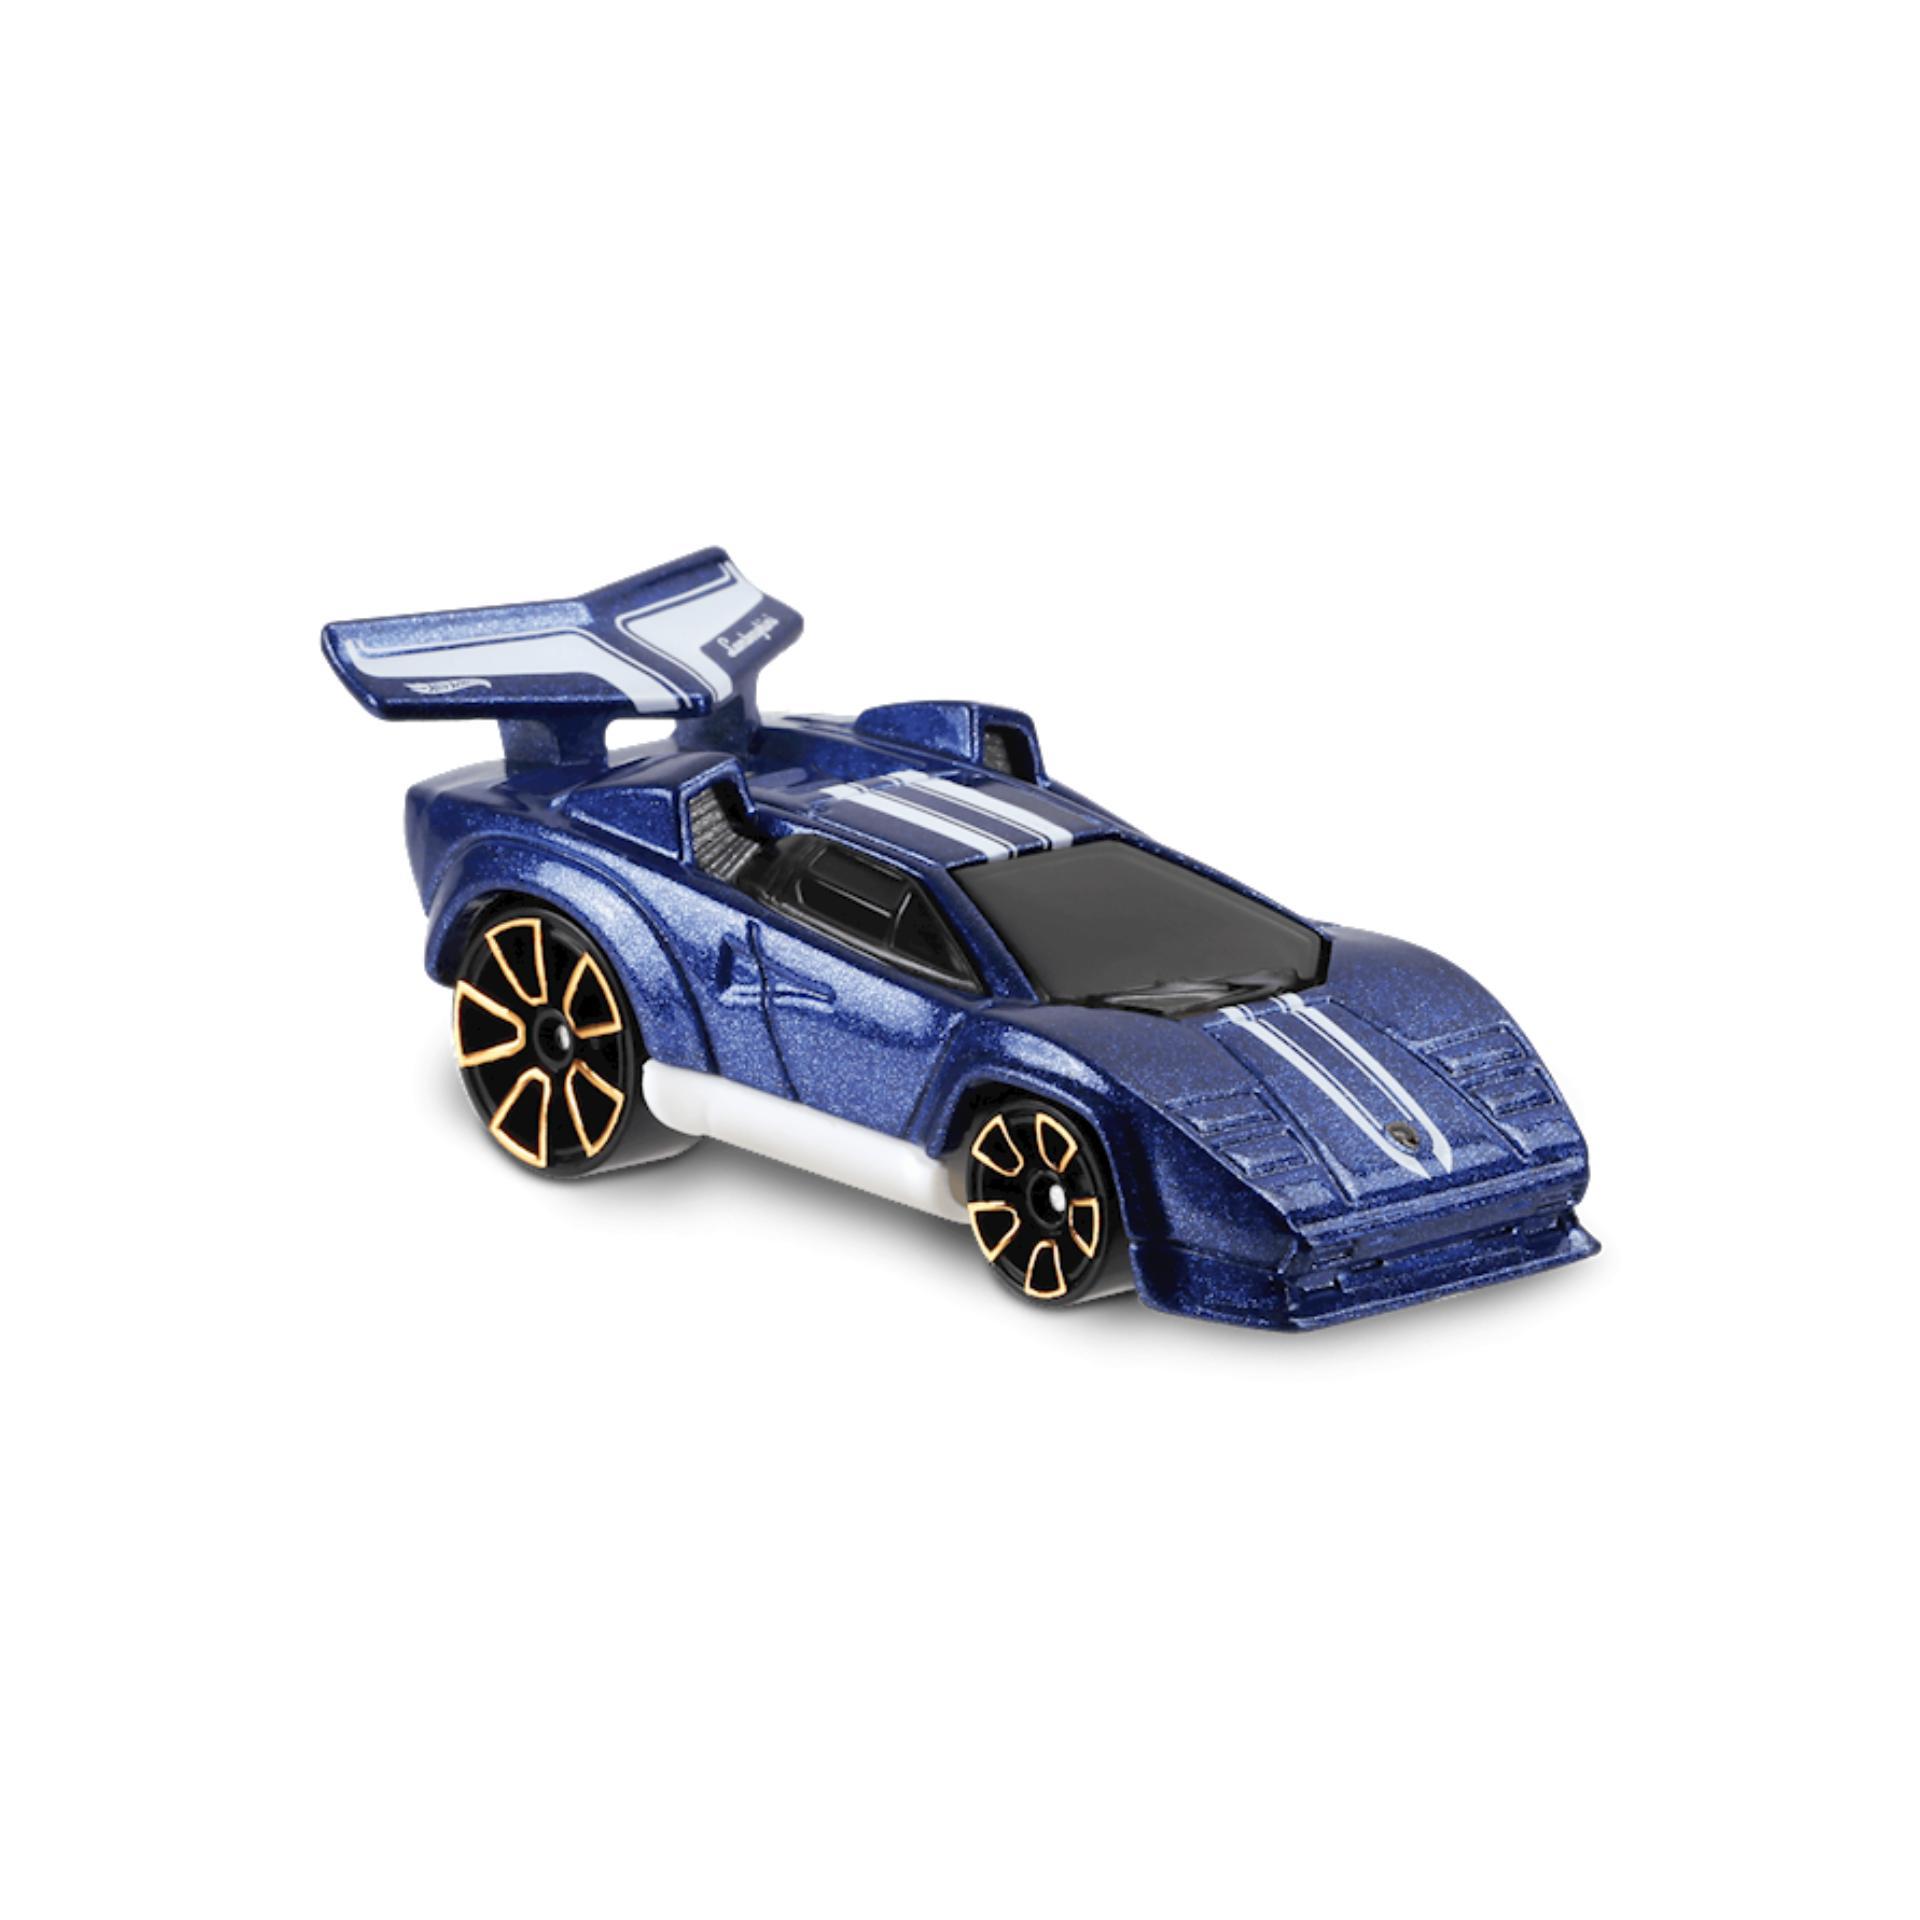 Hot Wheels Basic Car (DC: ADDH) - Lamborgini Countach